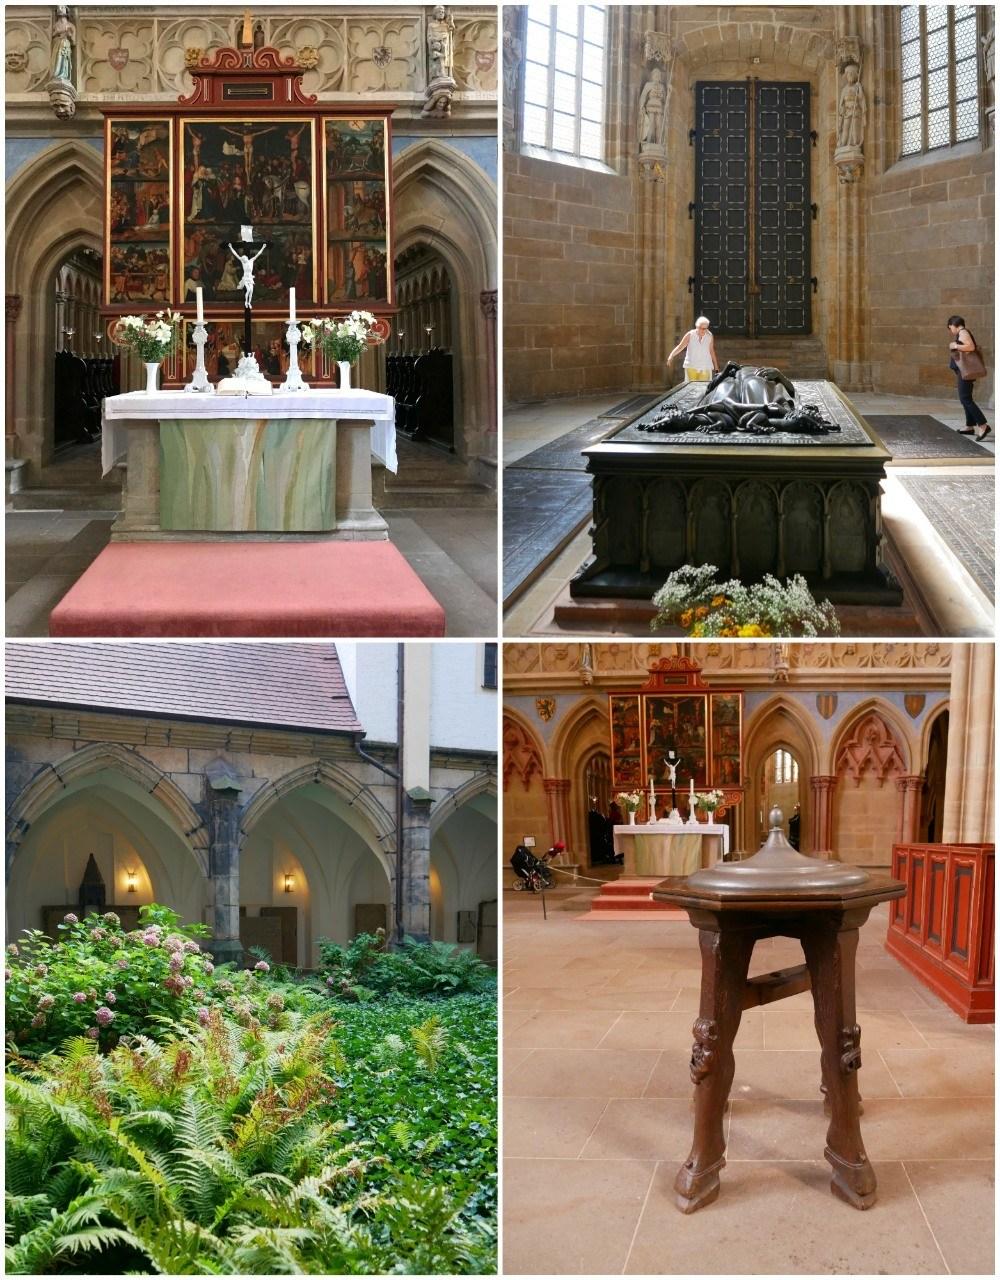 Cathedral interior in Meissen in Saxony, Germany Photo Heatheronhertravels.com